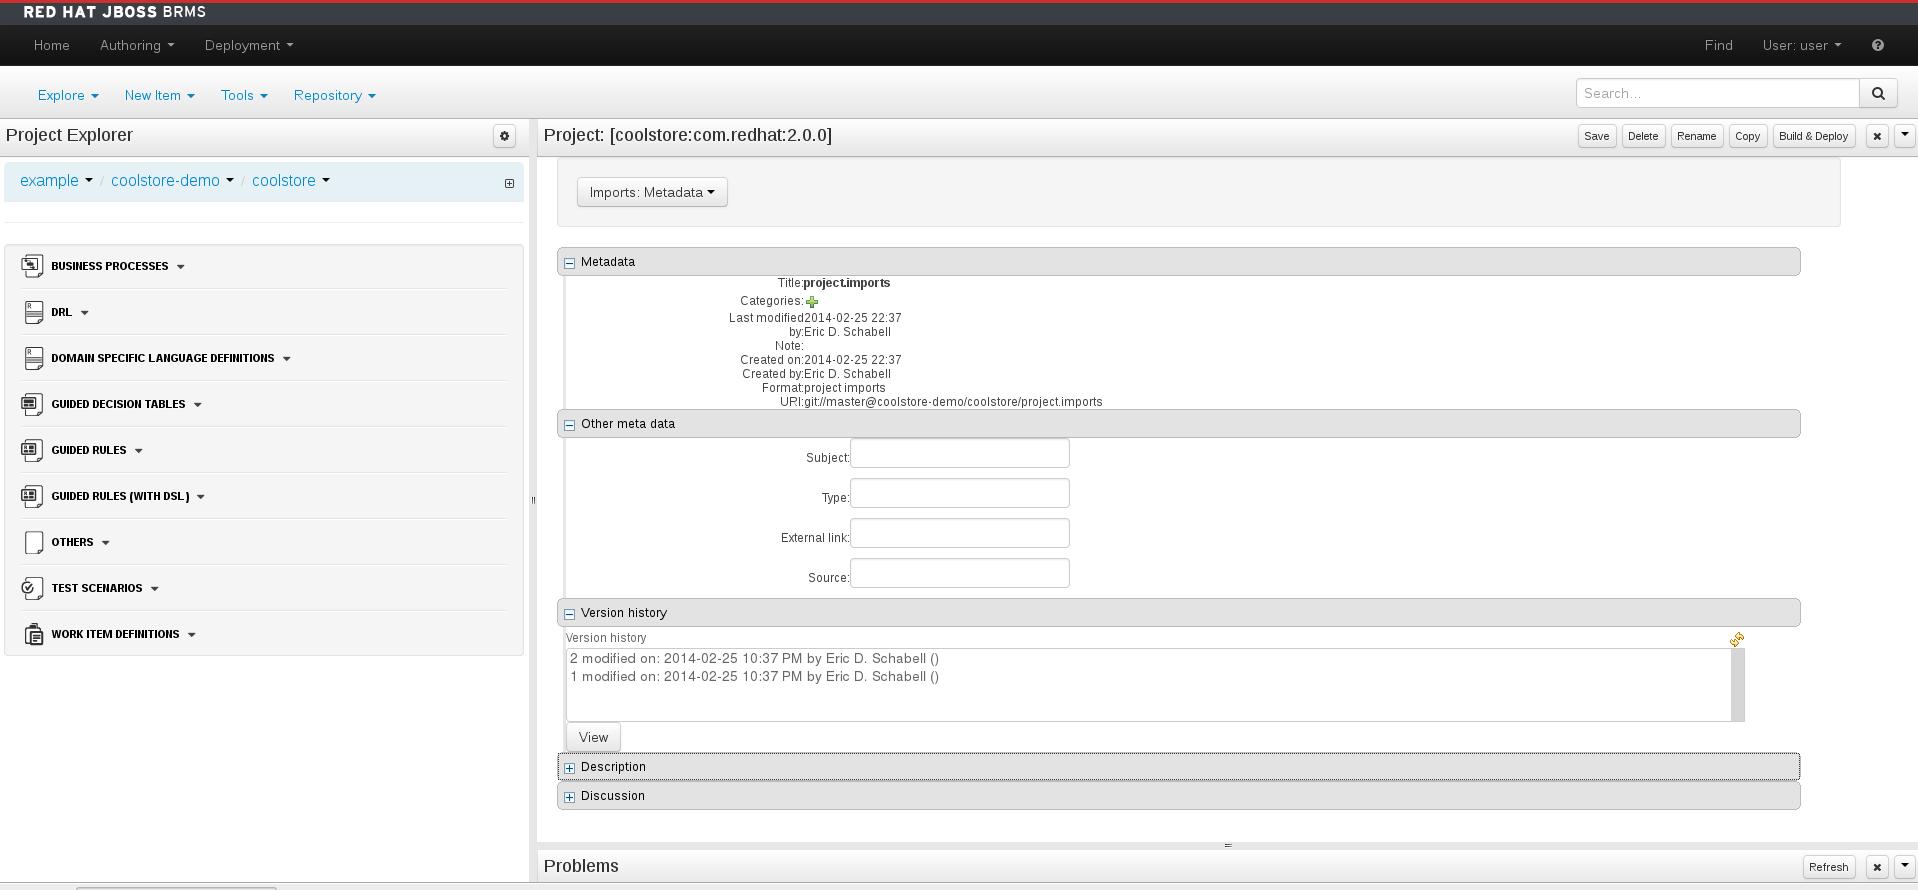 A screenshot of the BRMS Project Editor - Metadata Screen